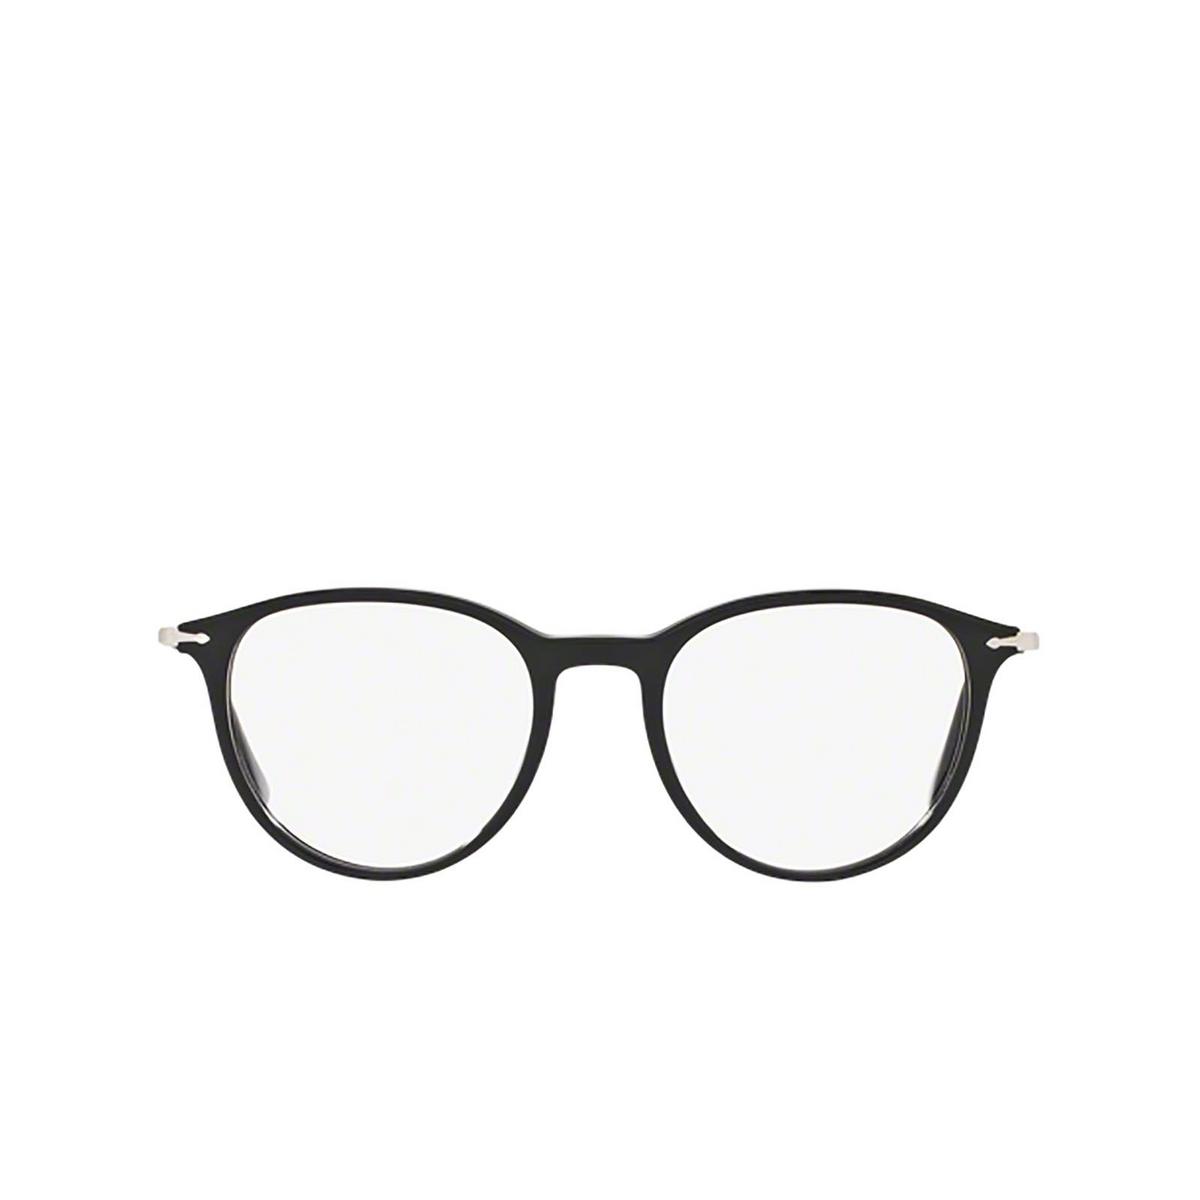 Persol® Rectangle Eyeglasses: PO3147V color Black 95 - front view.